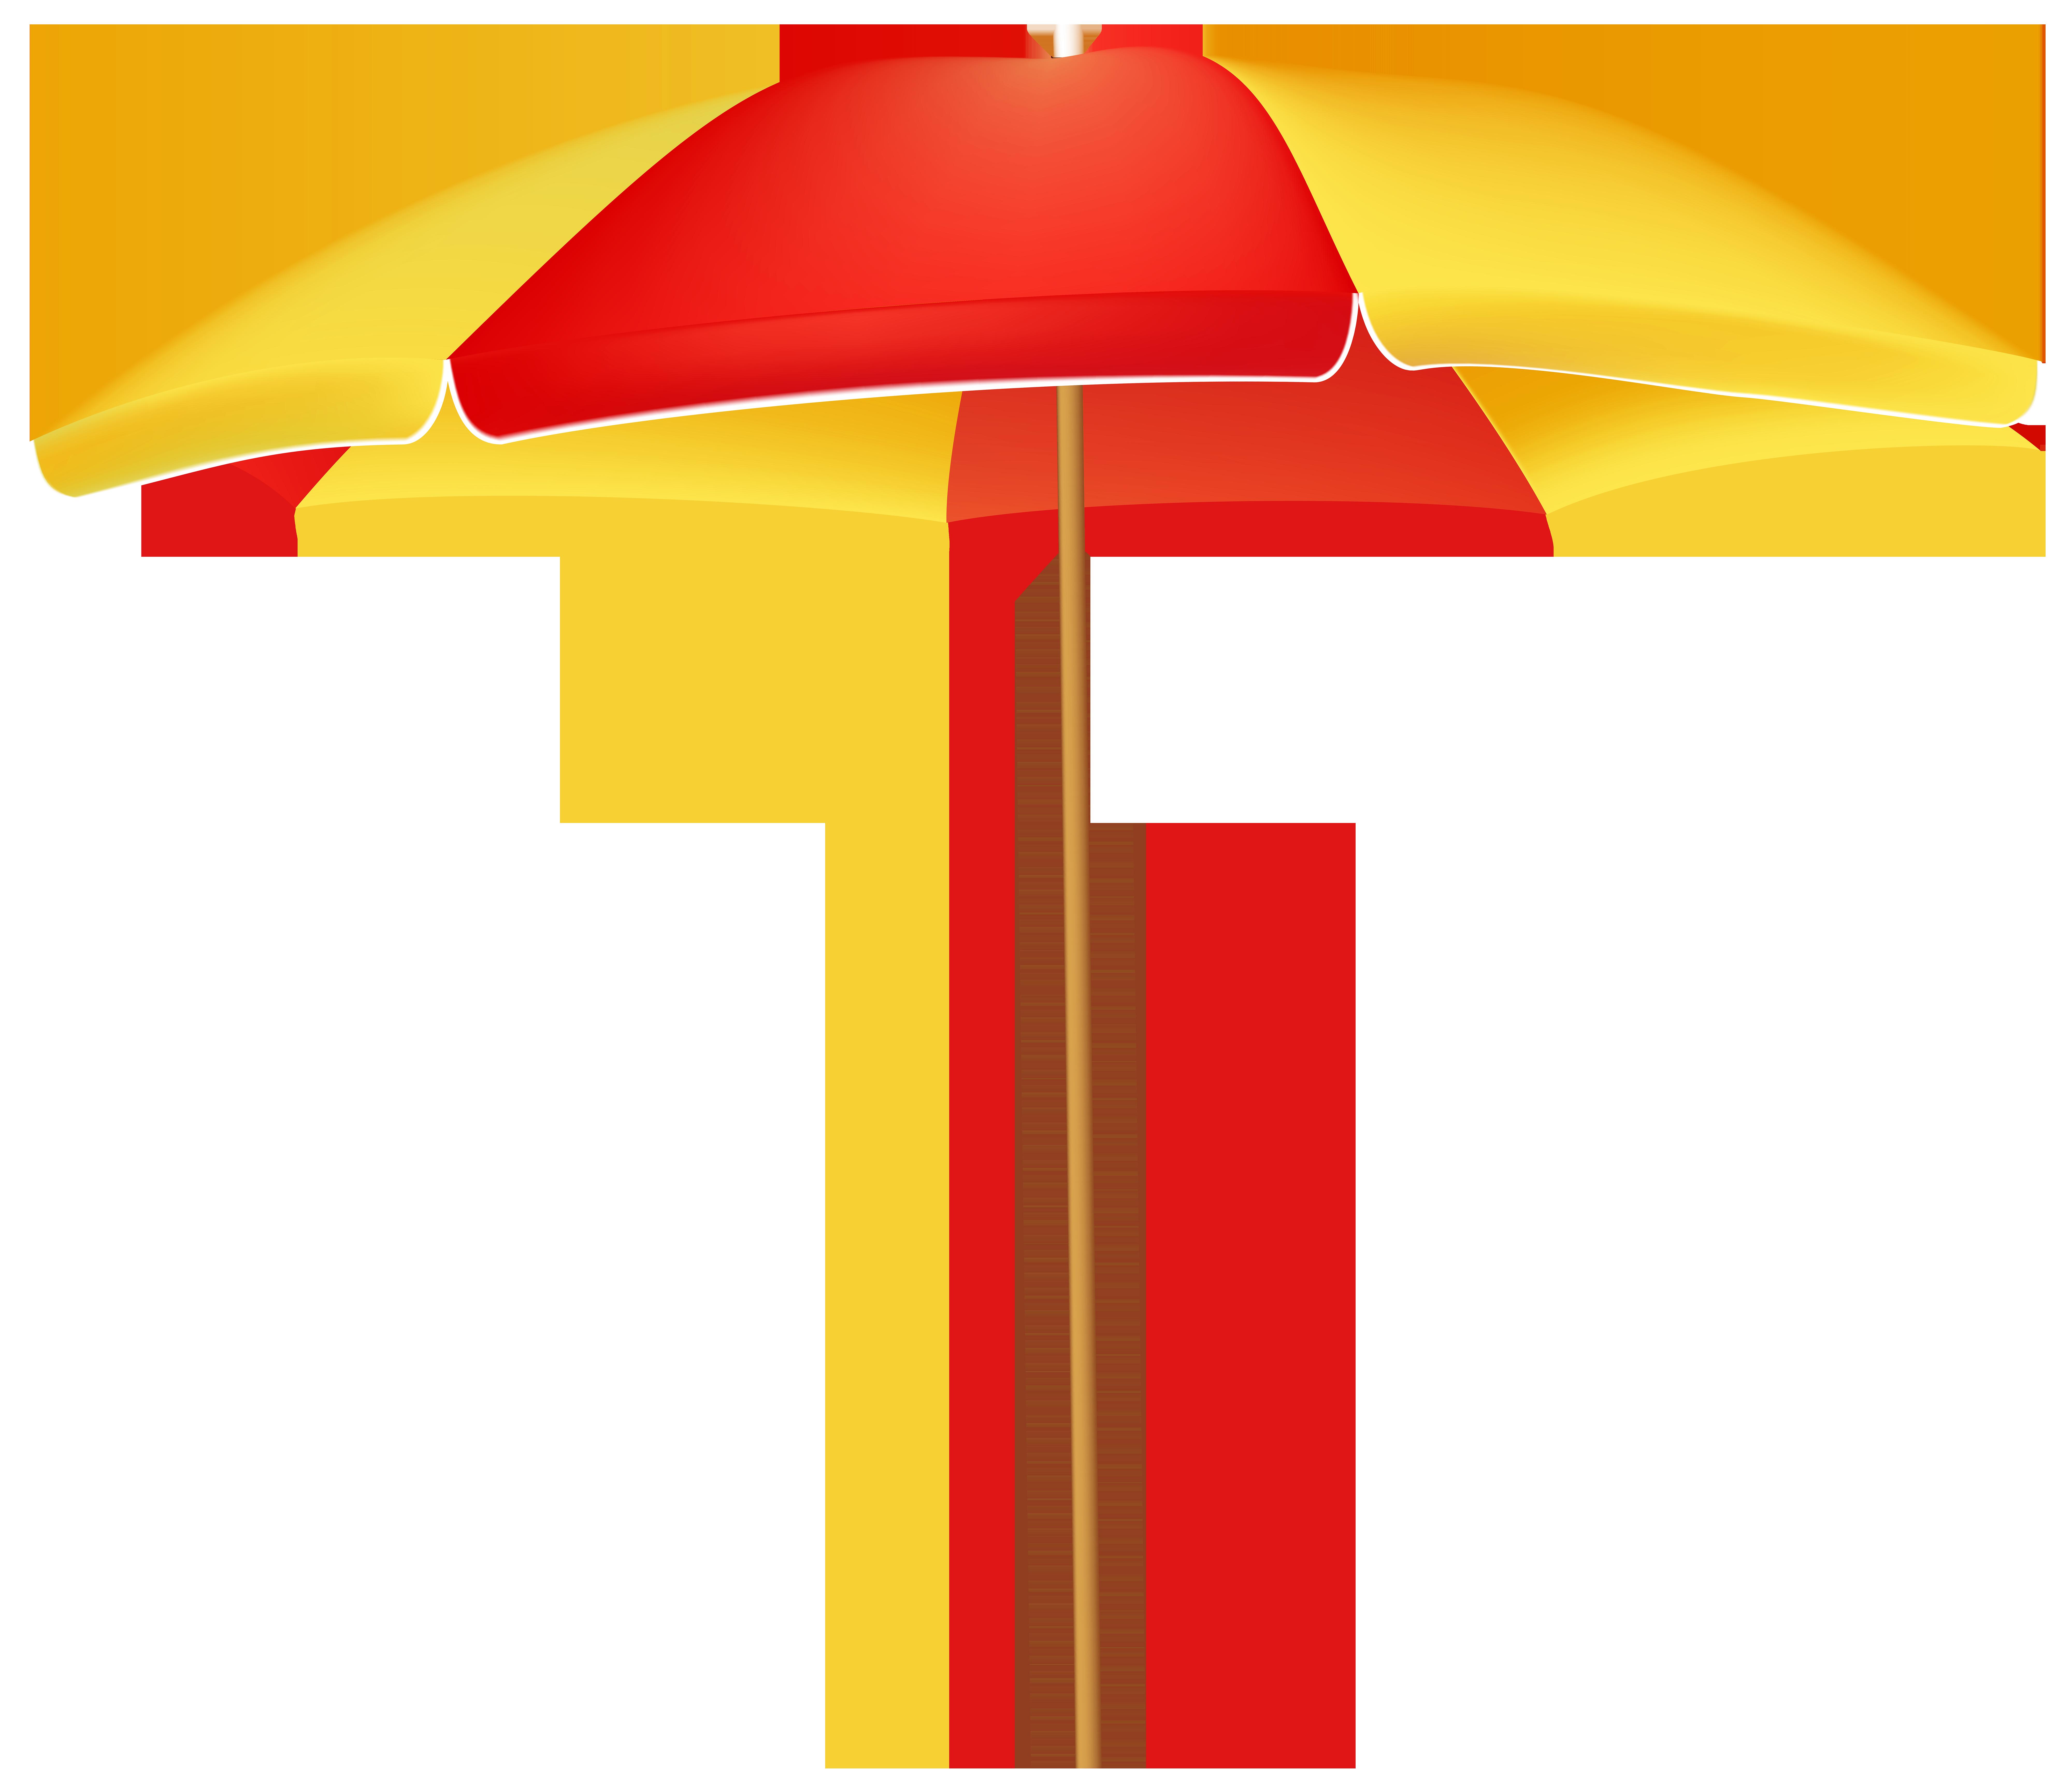 Beach umbrella with sun clipart banner freeuse stock Beach Umbrella PNG Clip Art - Best WEB Clipart banner freeuse stock